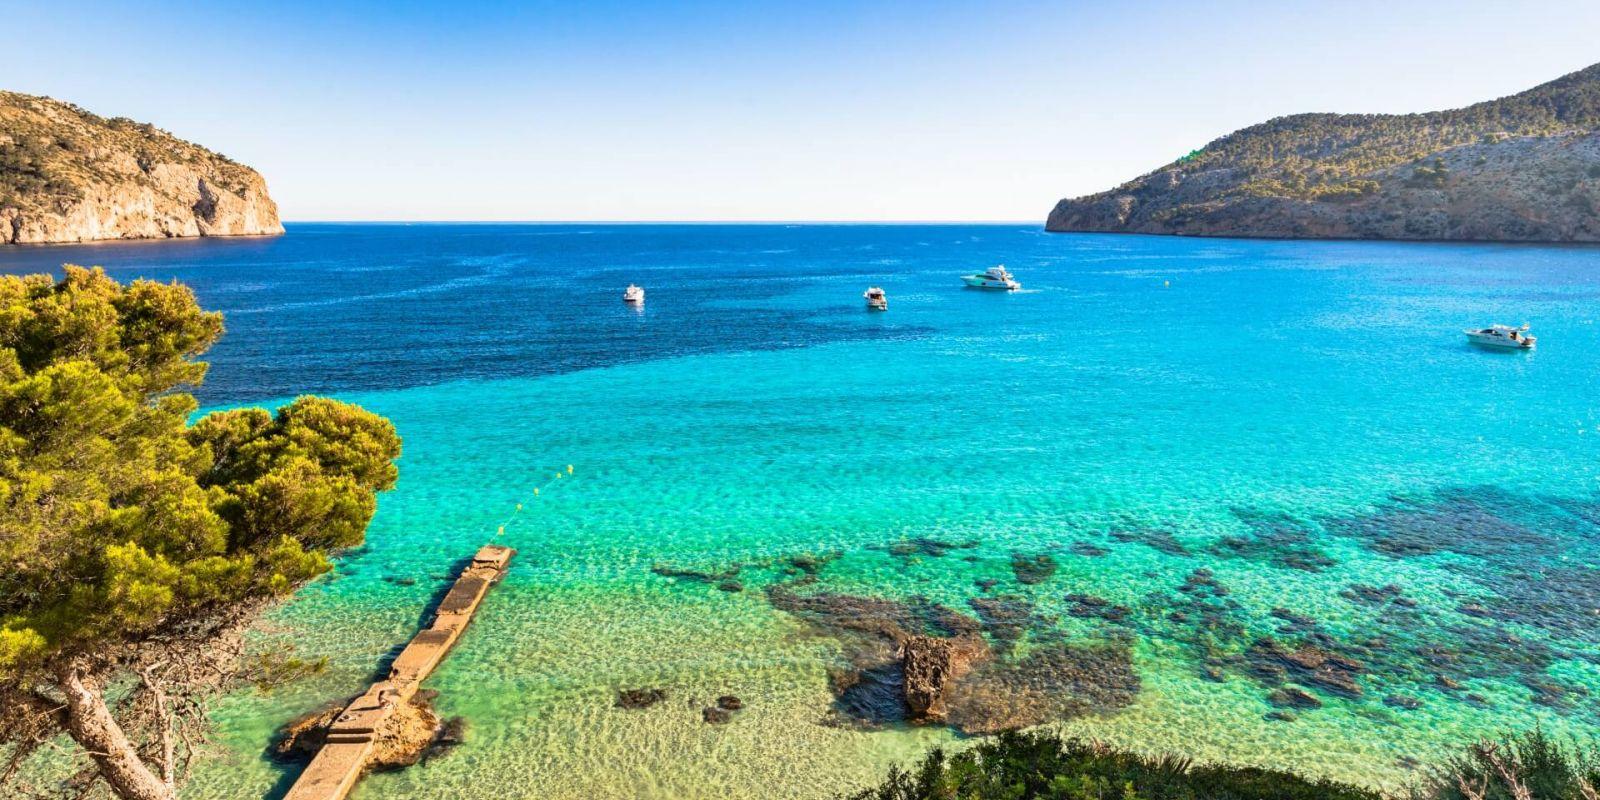 https://www.talamare.com/medias/Yacht charter Balearics, yacht rental Ibiza, Mallorca, Menorca, Formentera